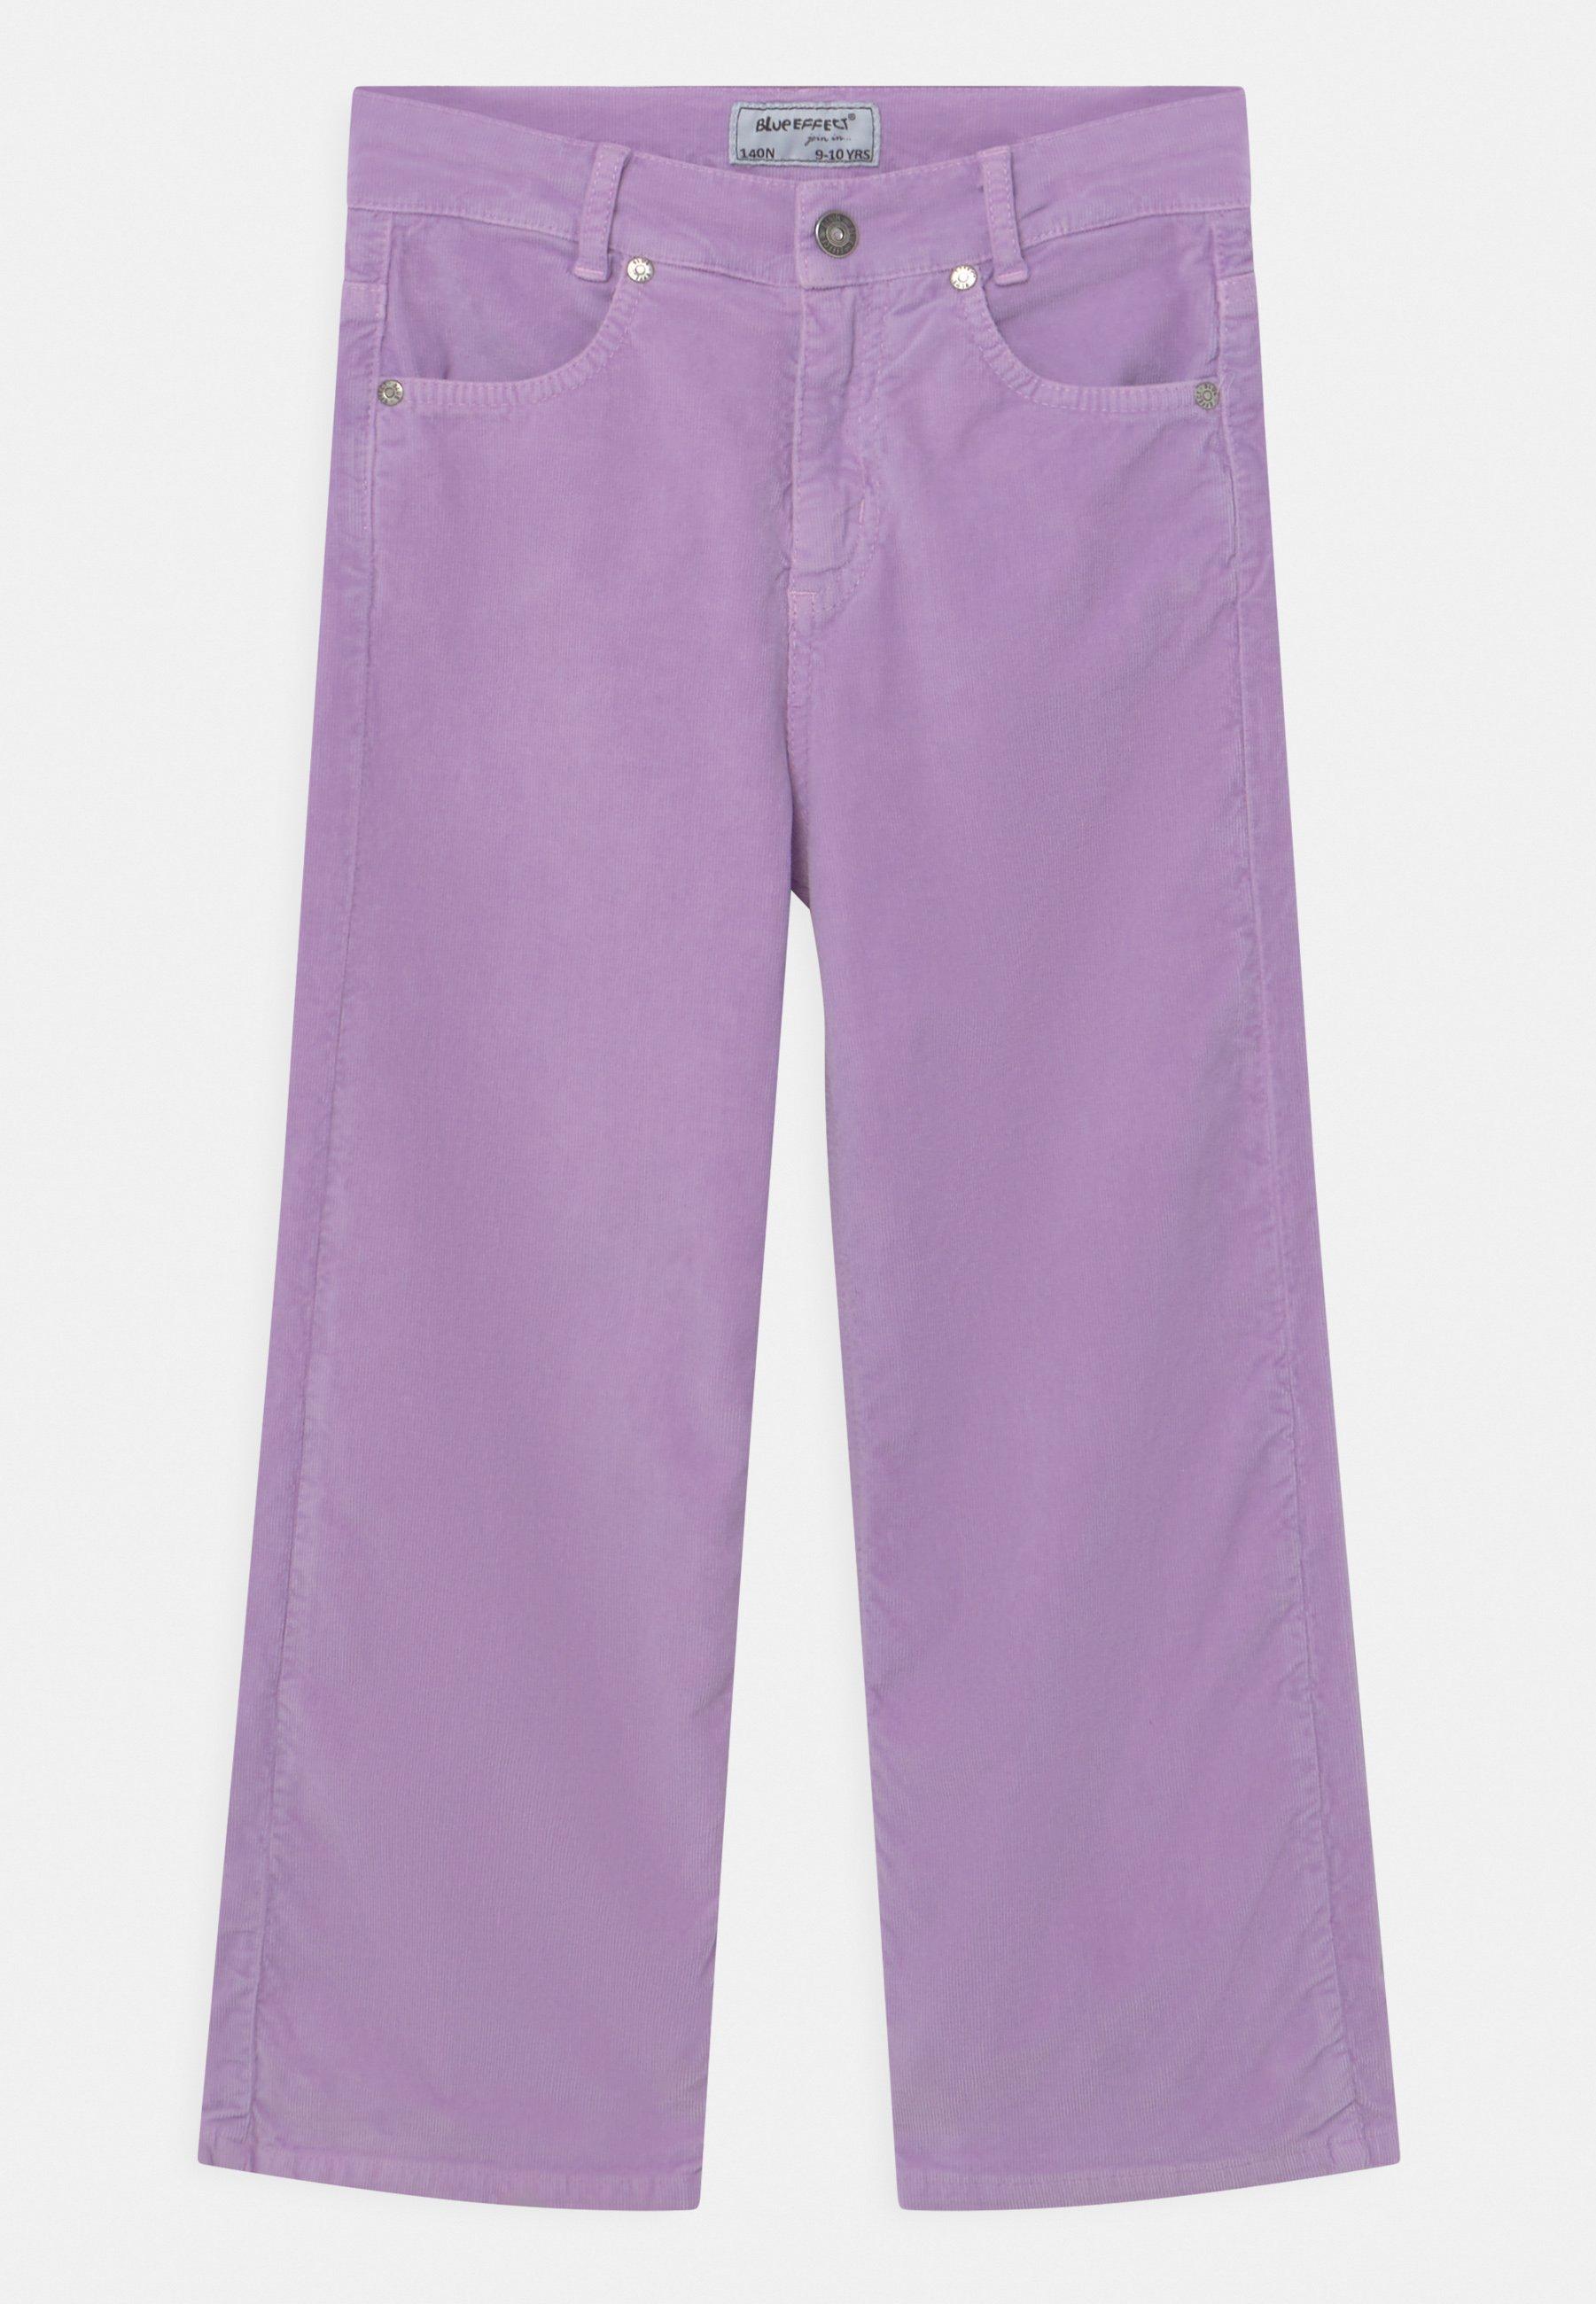 Kids GIRLS CROPPED PALAZZO - Trousers